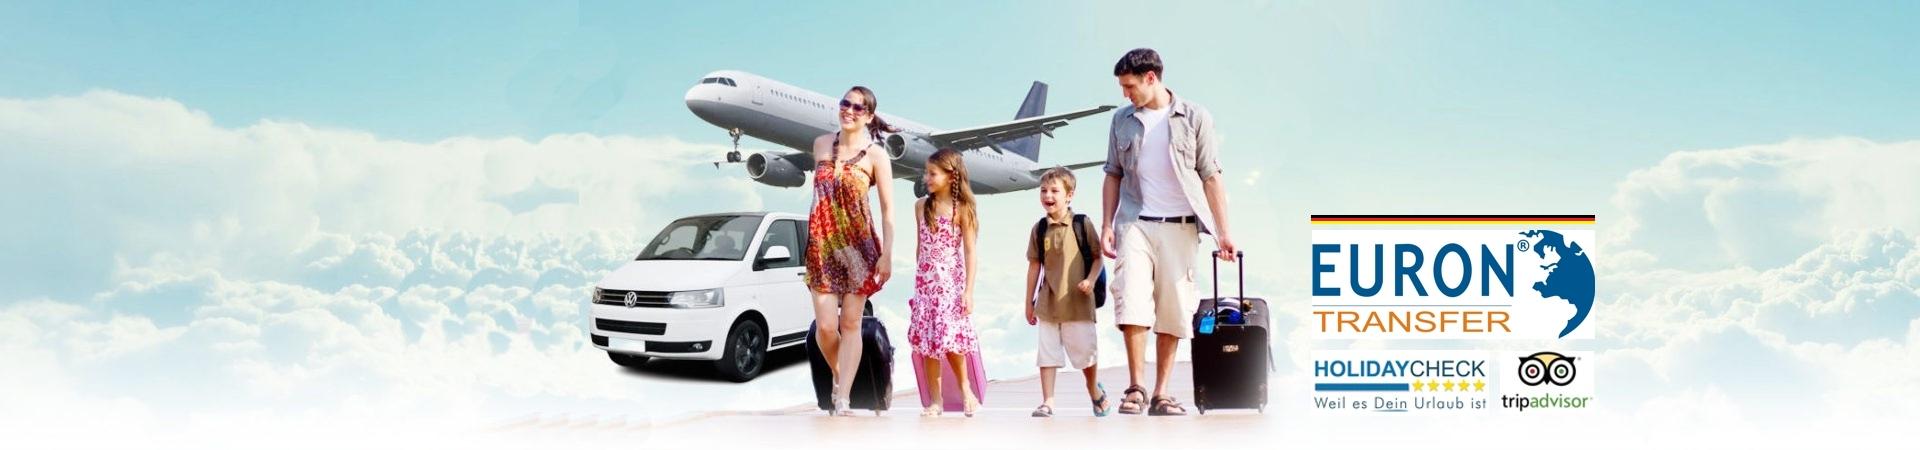 antalya-airport-transfers-to-belek-alanya-lara-side-avsallar-mahmutlar